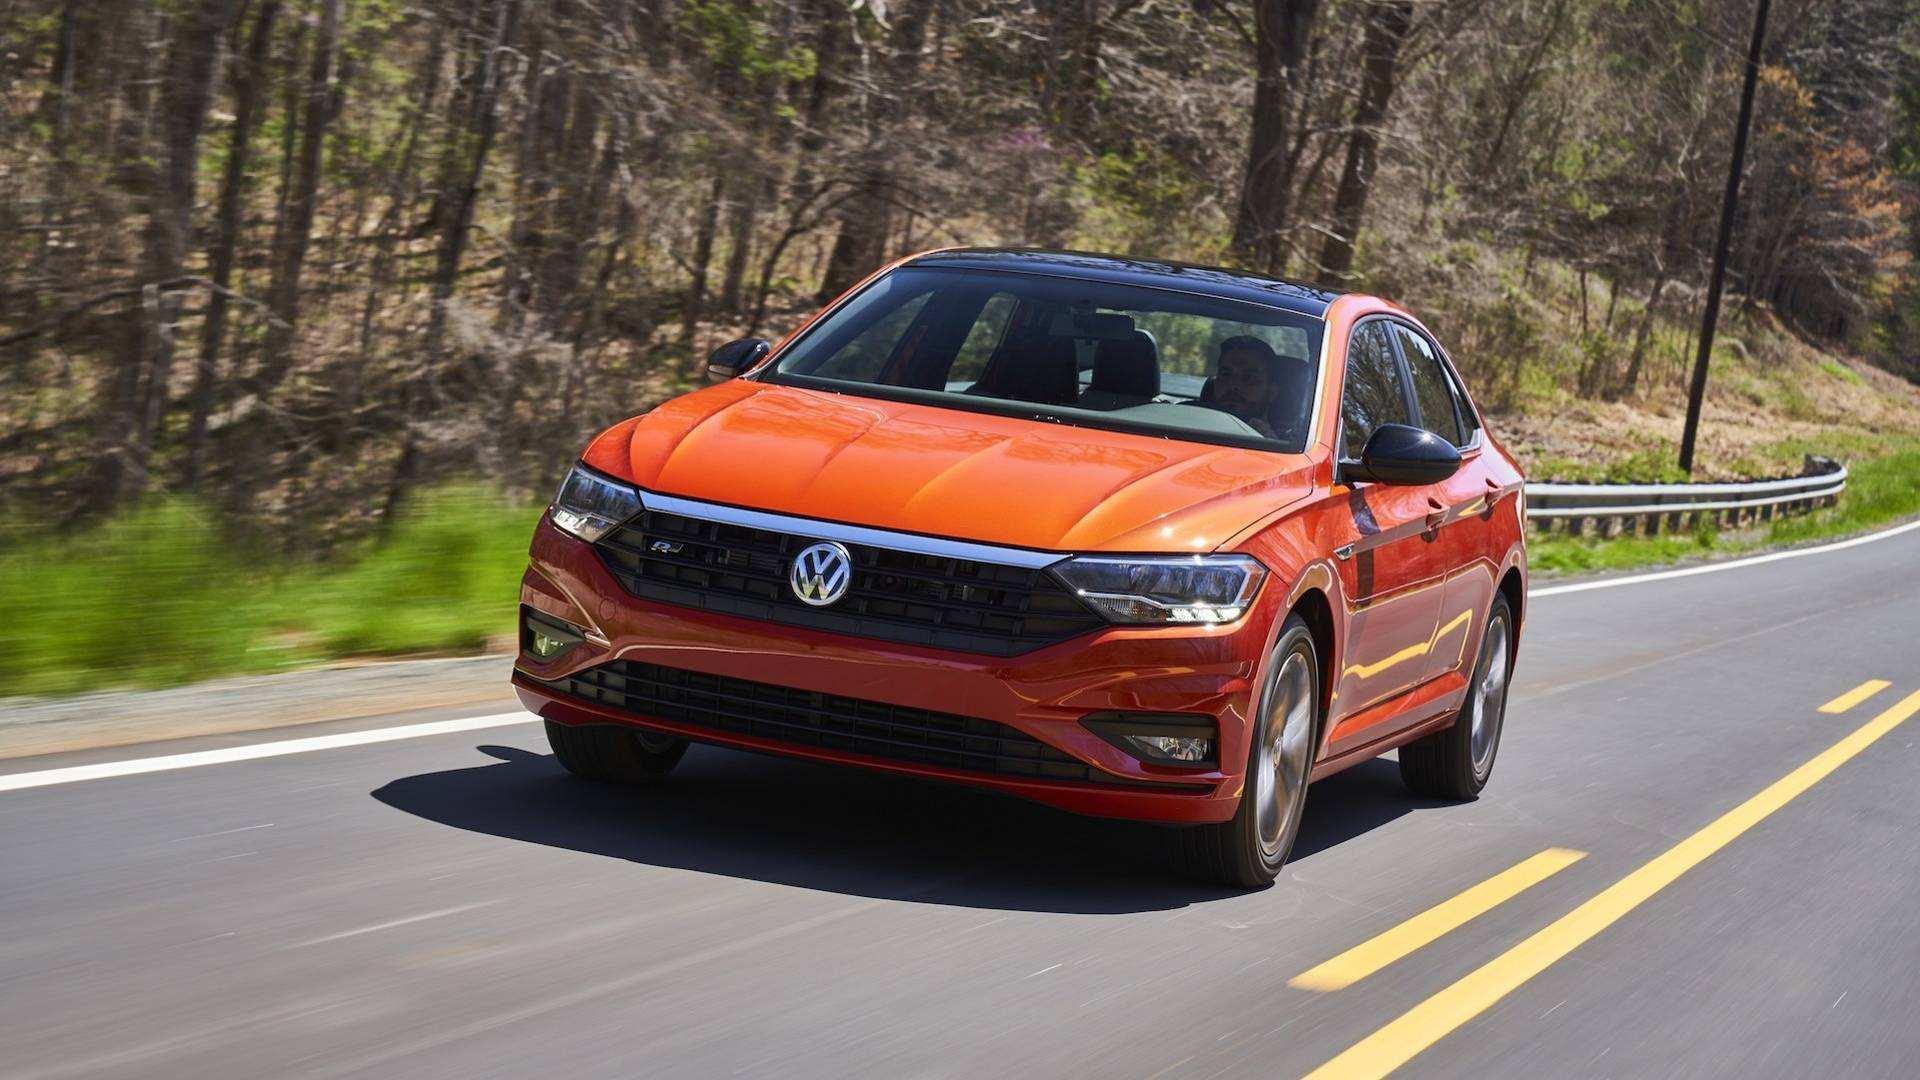 49 Great The Volkswagen Jetta 2019 Fuel Economy Engine Redesign for The Volkswagen Jetta 2019 Fuel Economy Engine